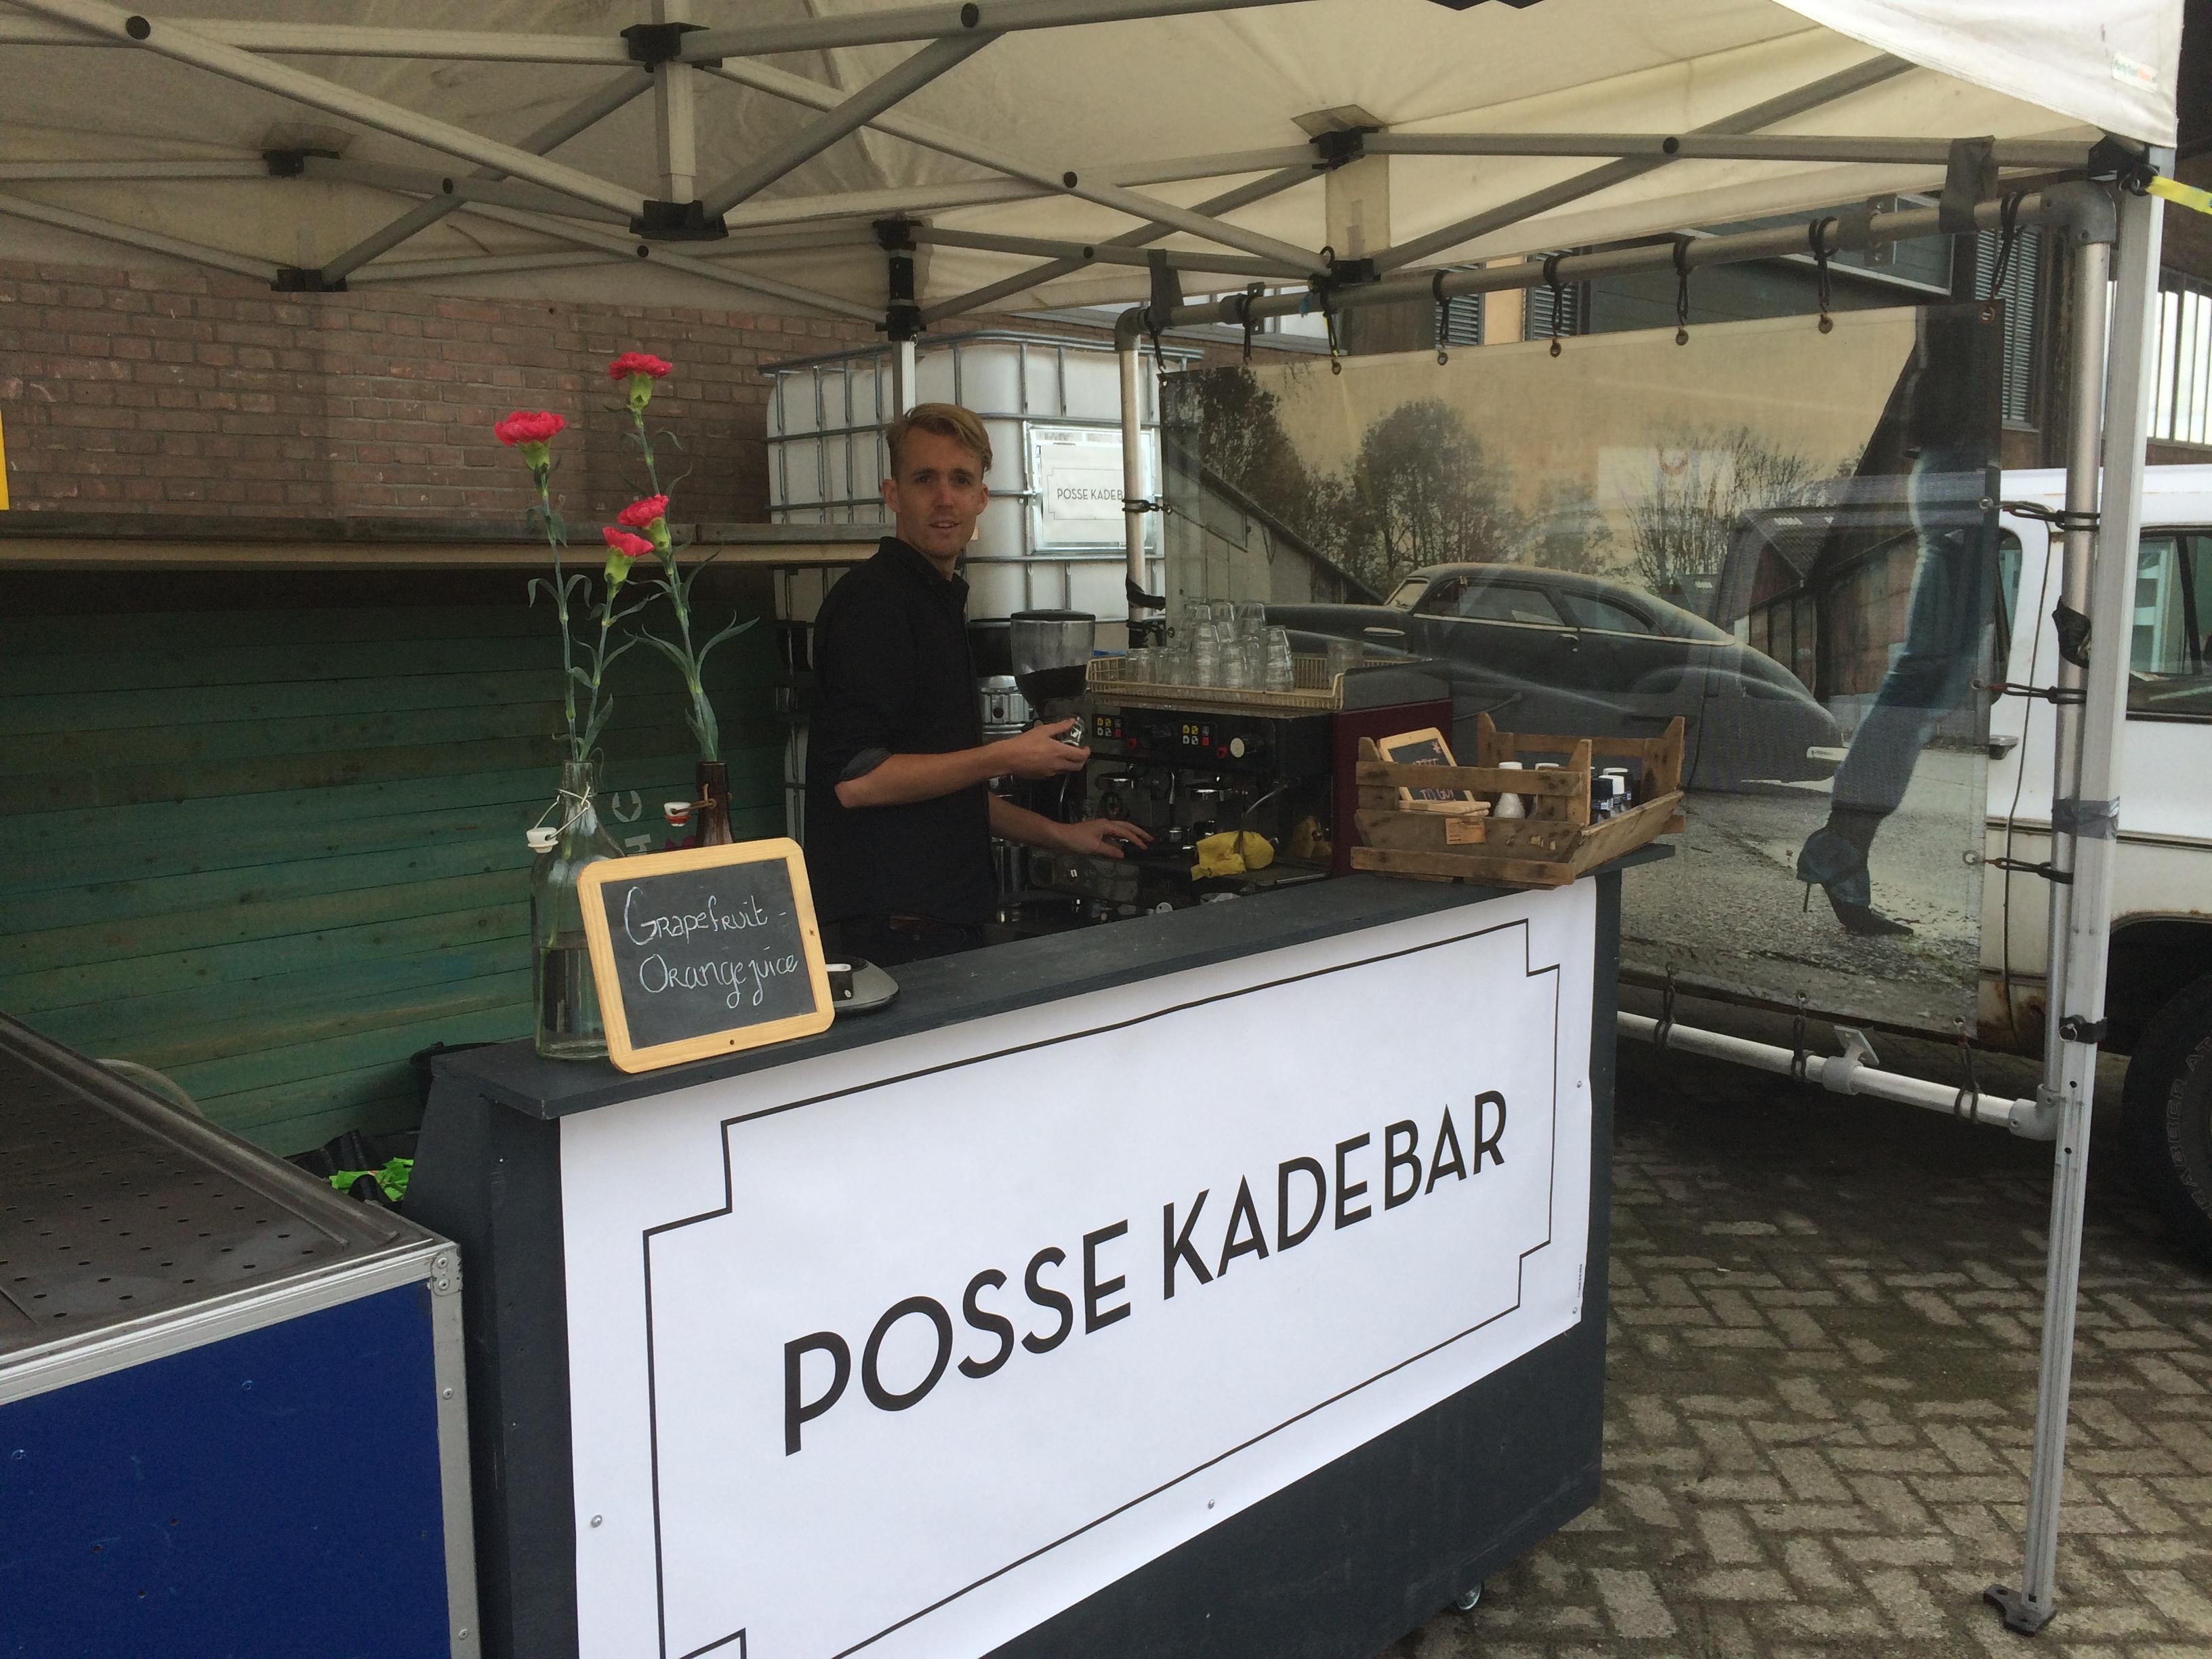 POSSE KADEBAR